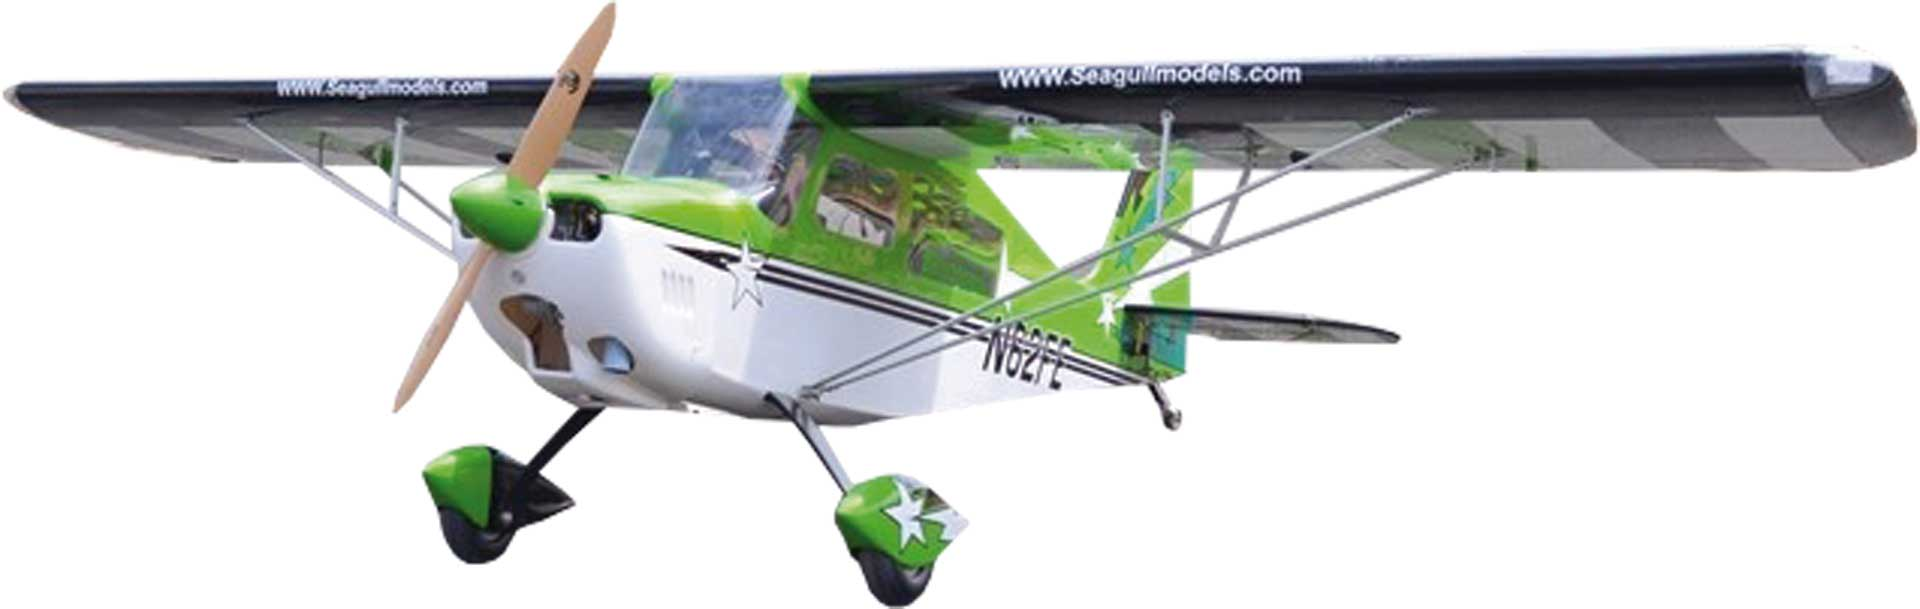 SG-MODELS DECATHLON 60-85CC 3D ARF GRÜN 3,1M